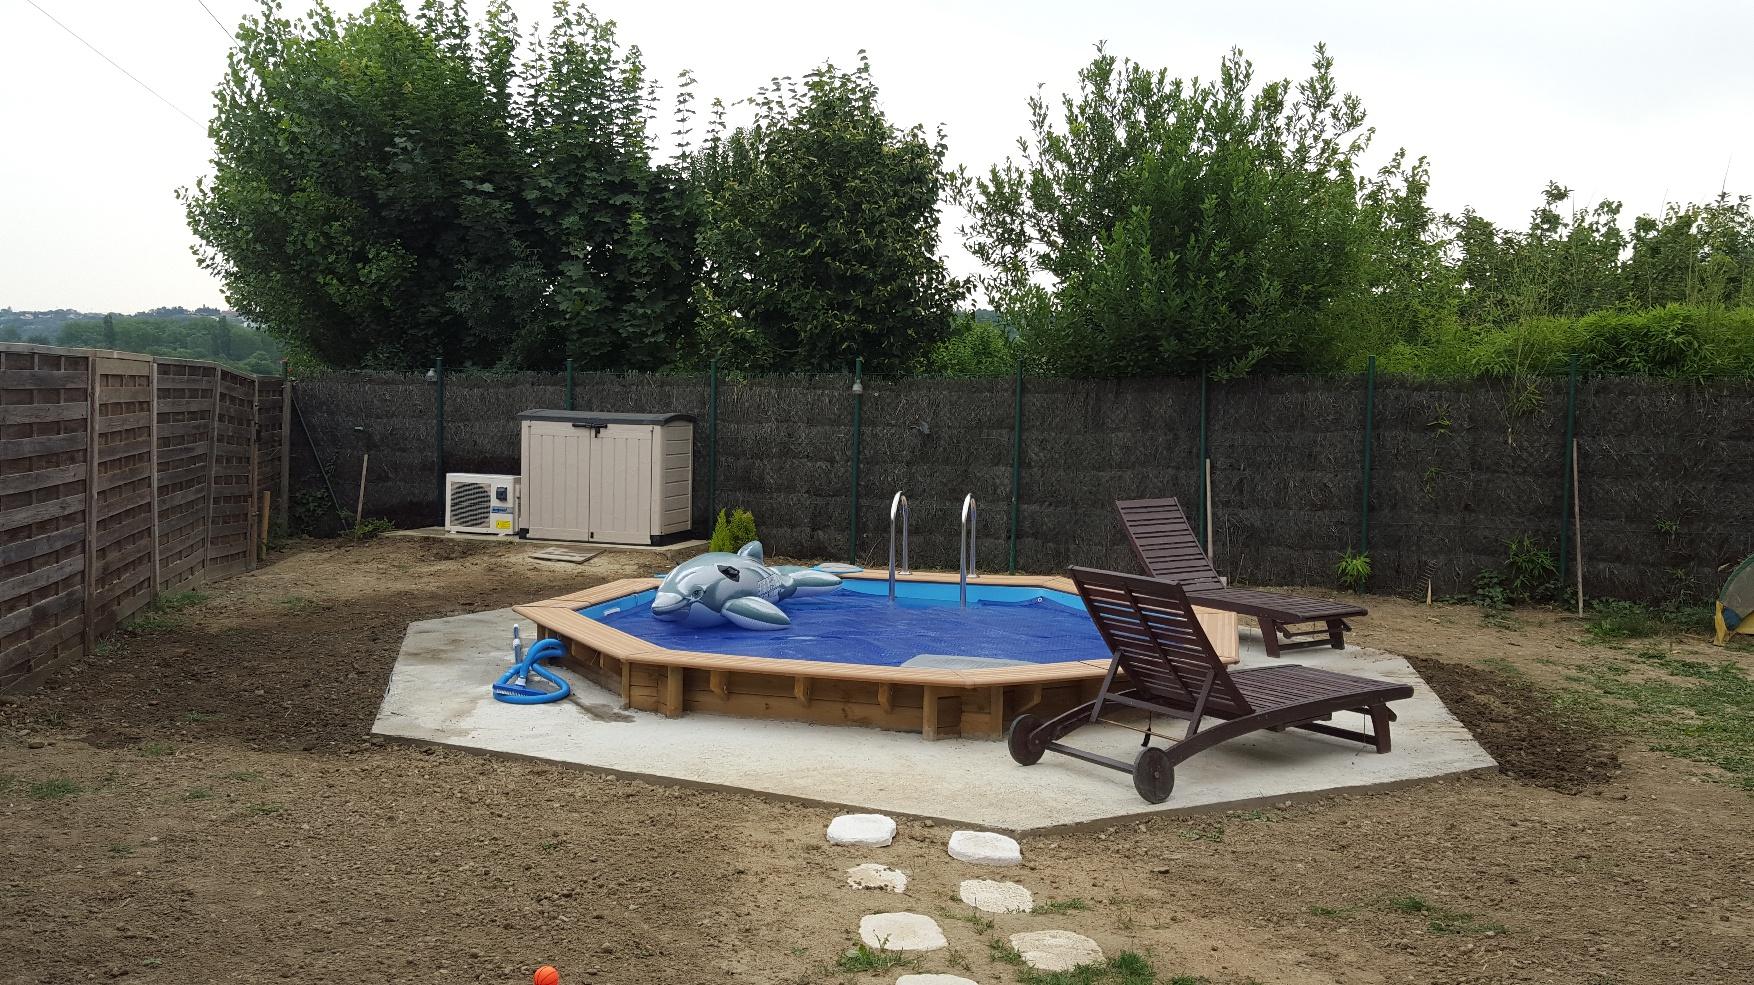 piscine bois semi enterr e hexagonale portet sur garonne. Black Bedroom Furniture Sets. Home Design Ideas